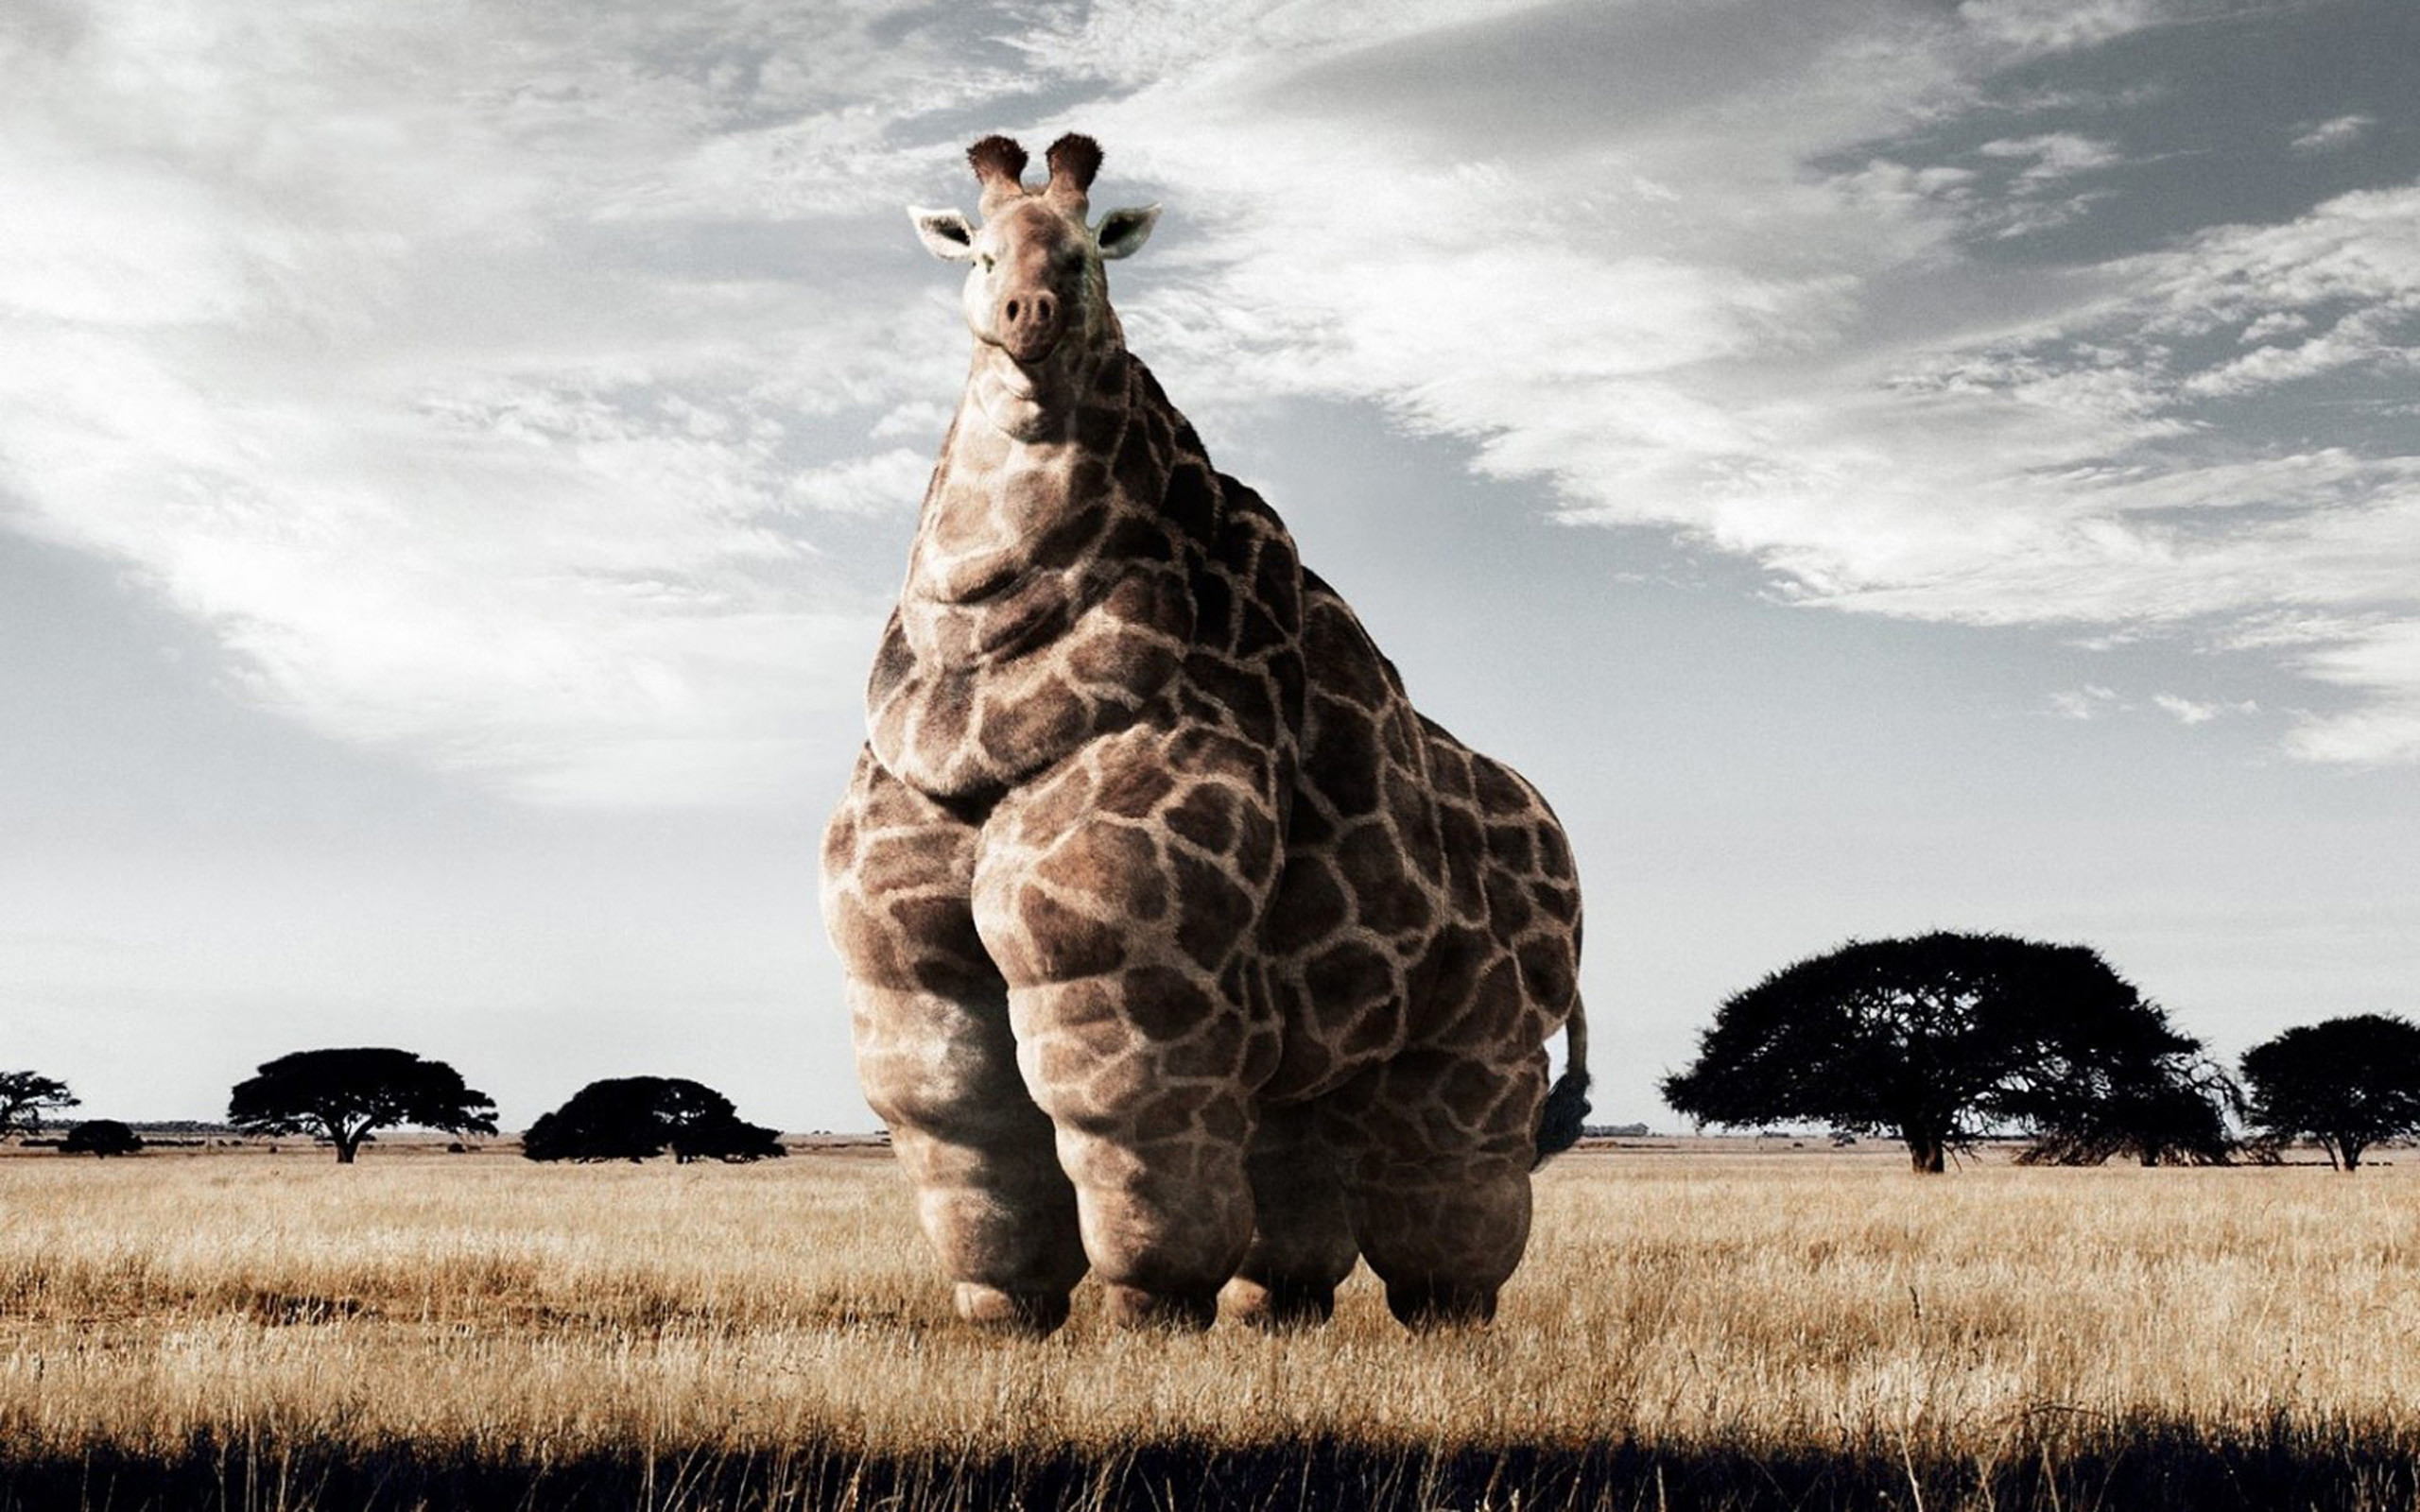 Cute Giraffe Wallpaper High Quality Resolution